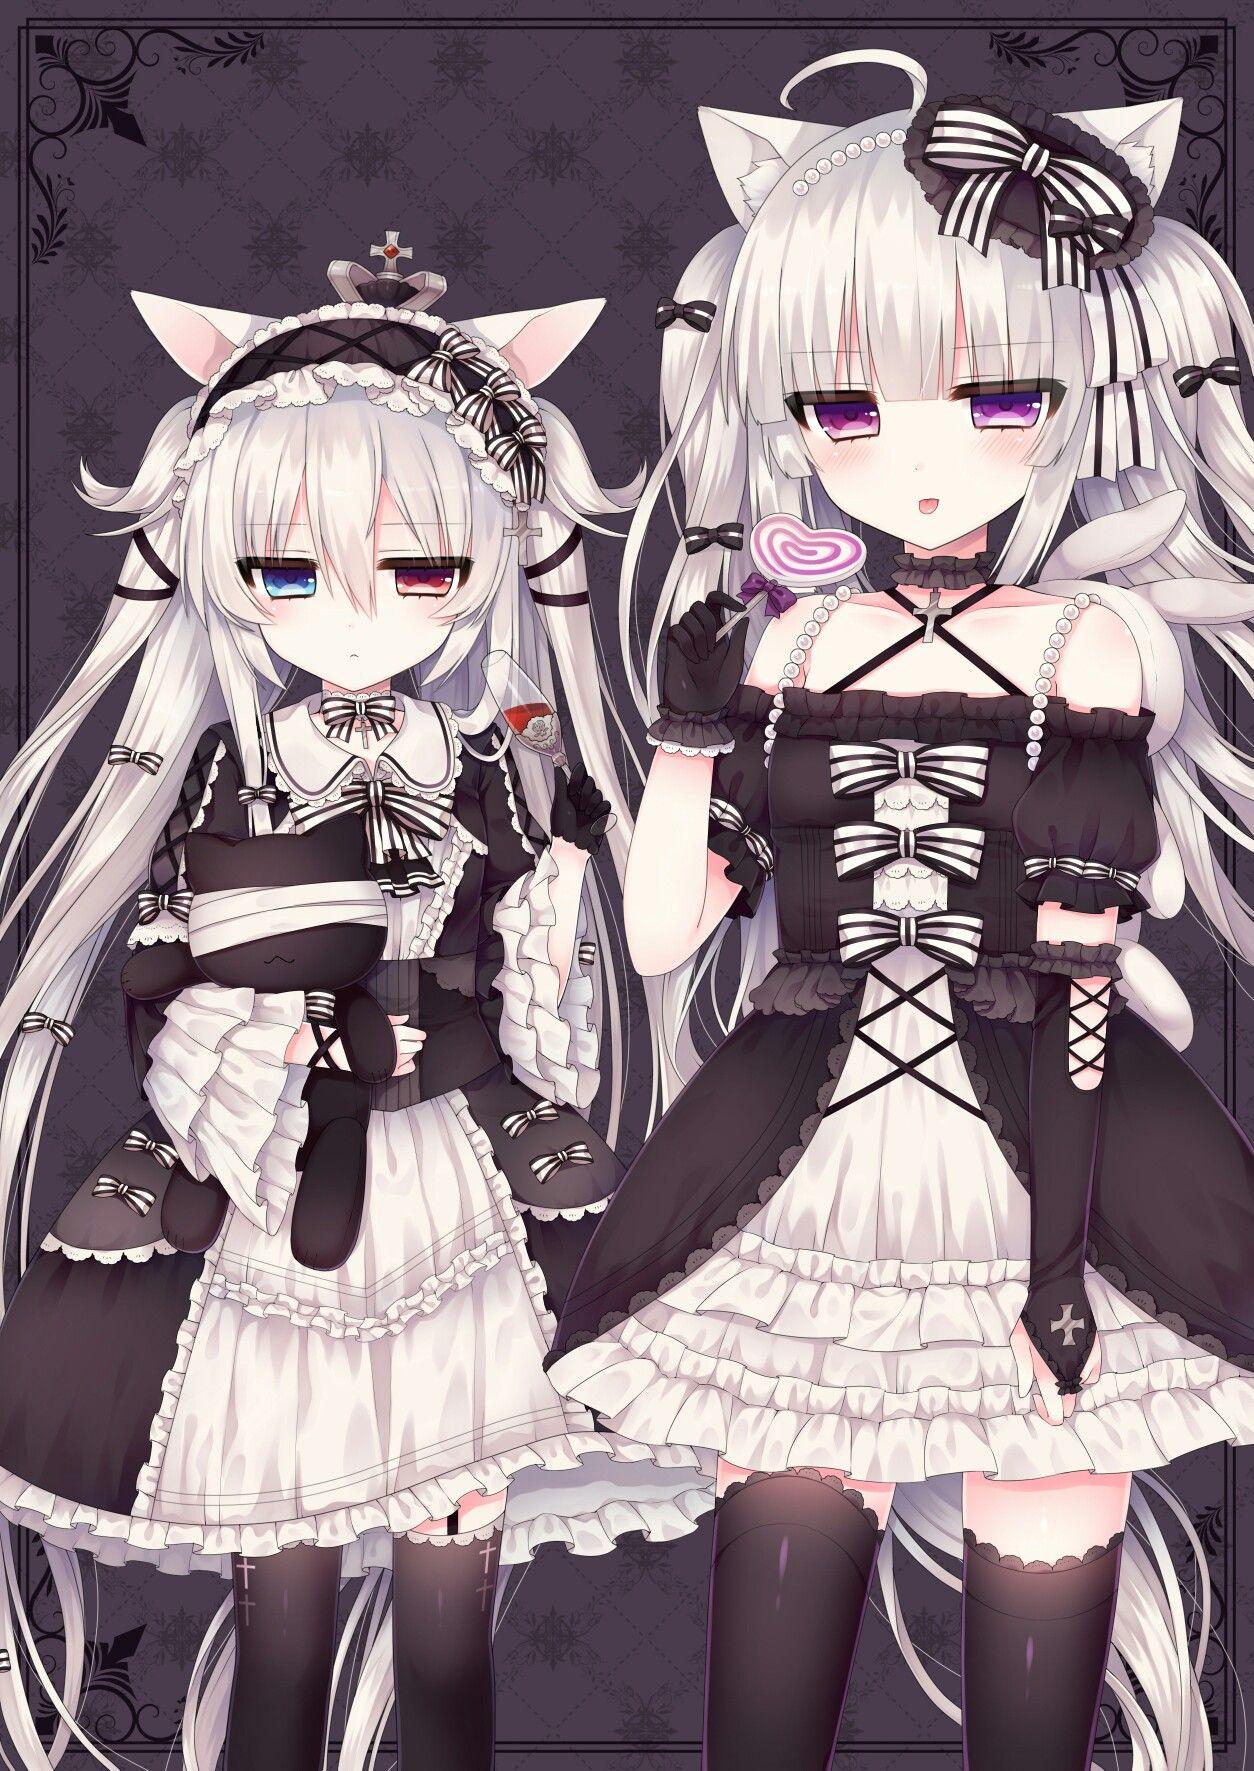 Alicerabbit Zerochan Anime Image Board Chicas kawai